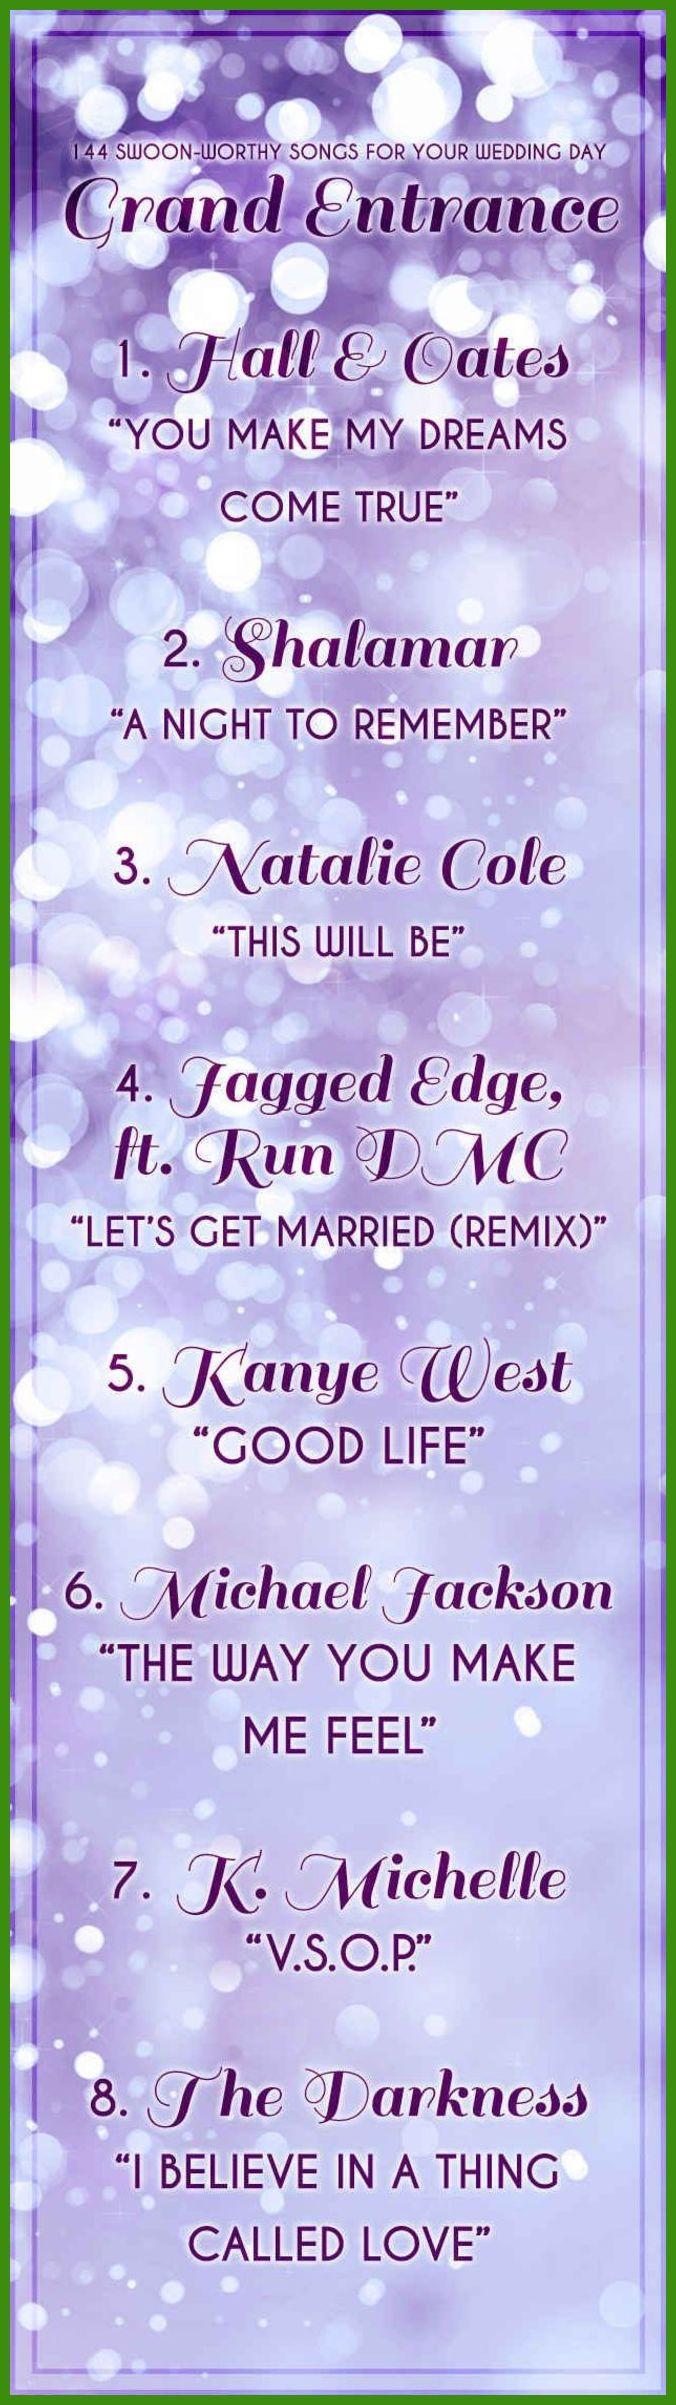 Best 25+ Christian wedding songs ideas on Pinterest   Christian ...